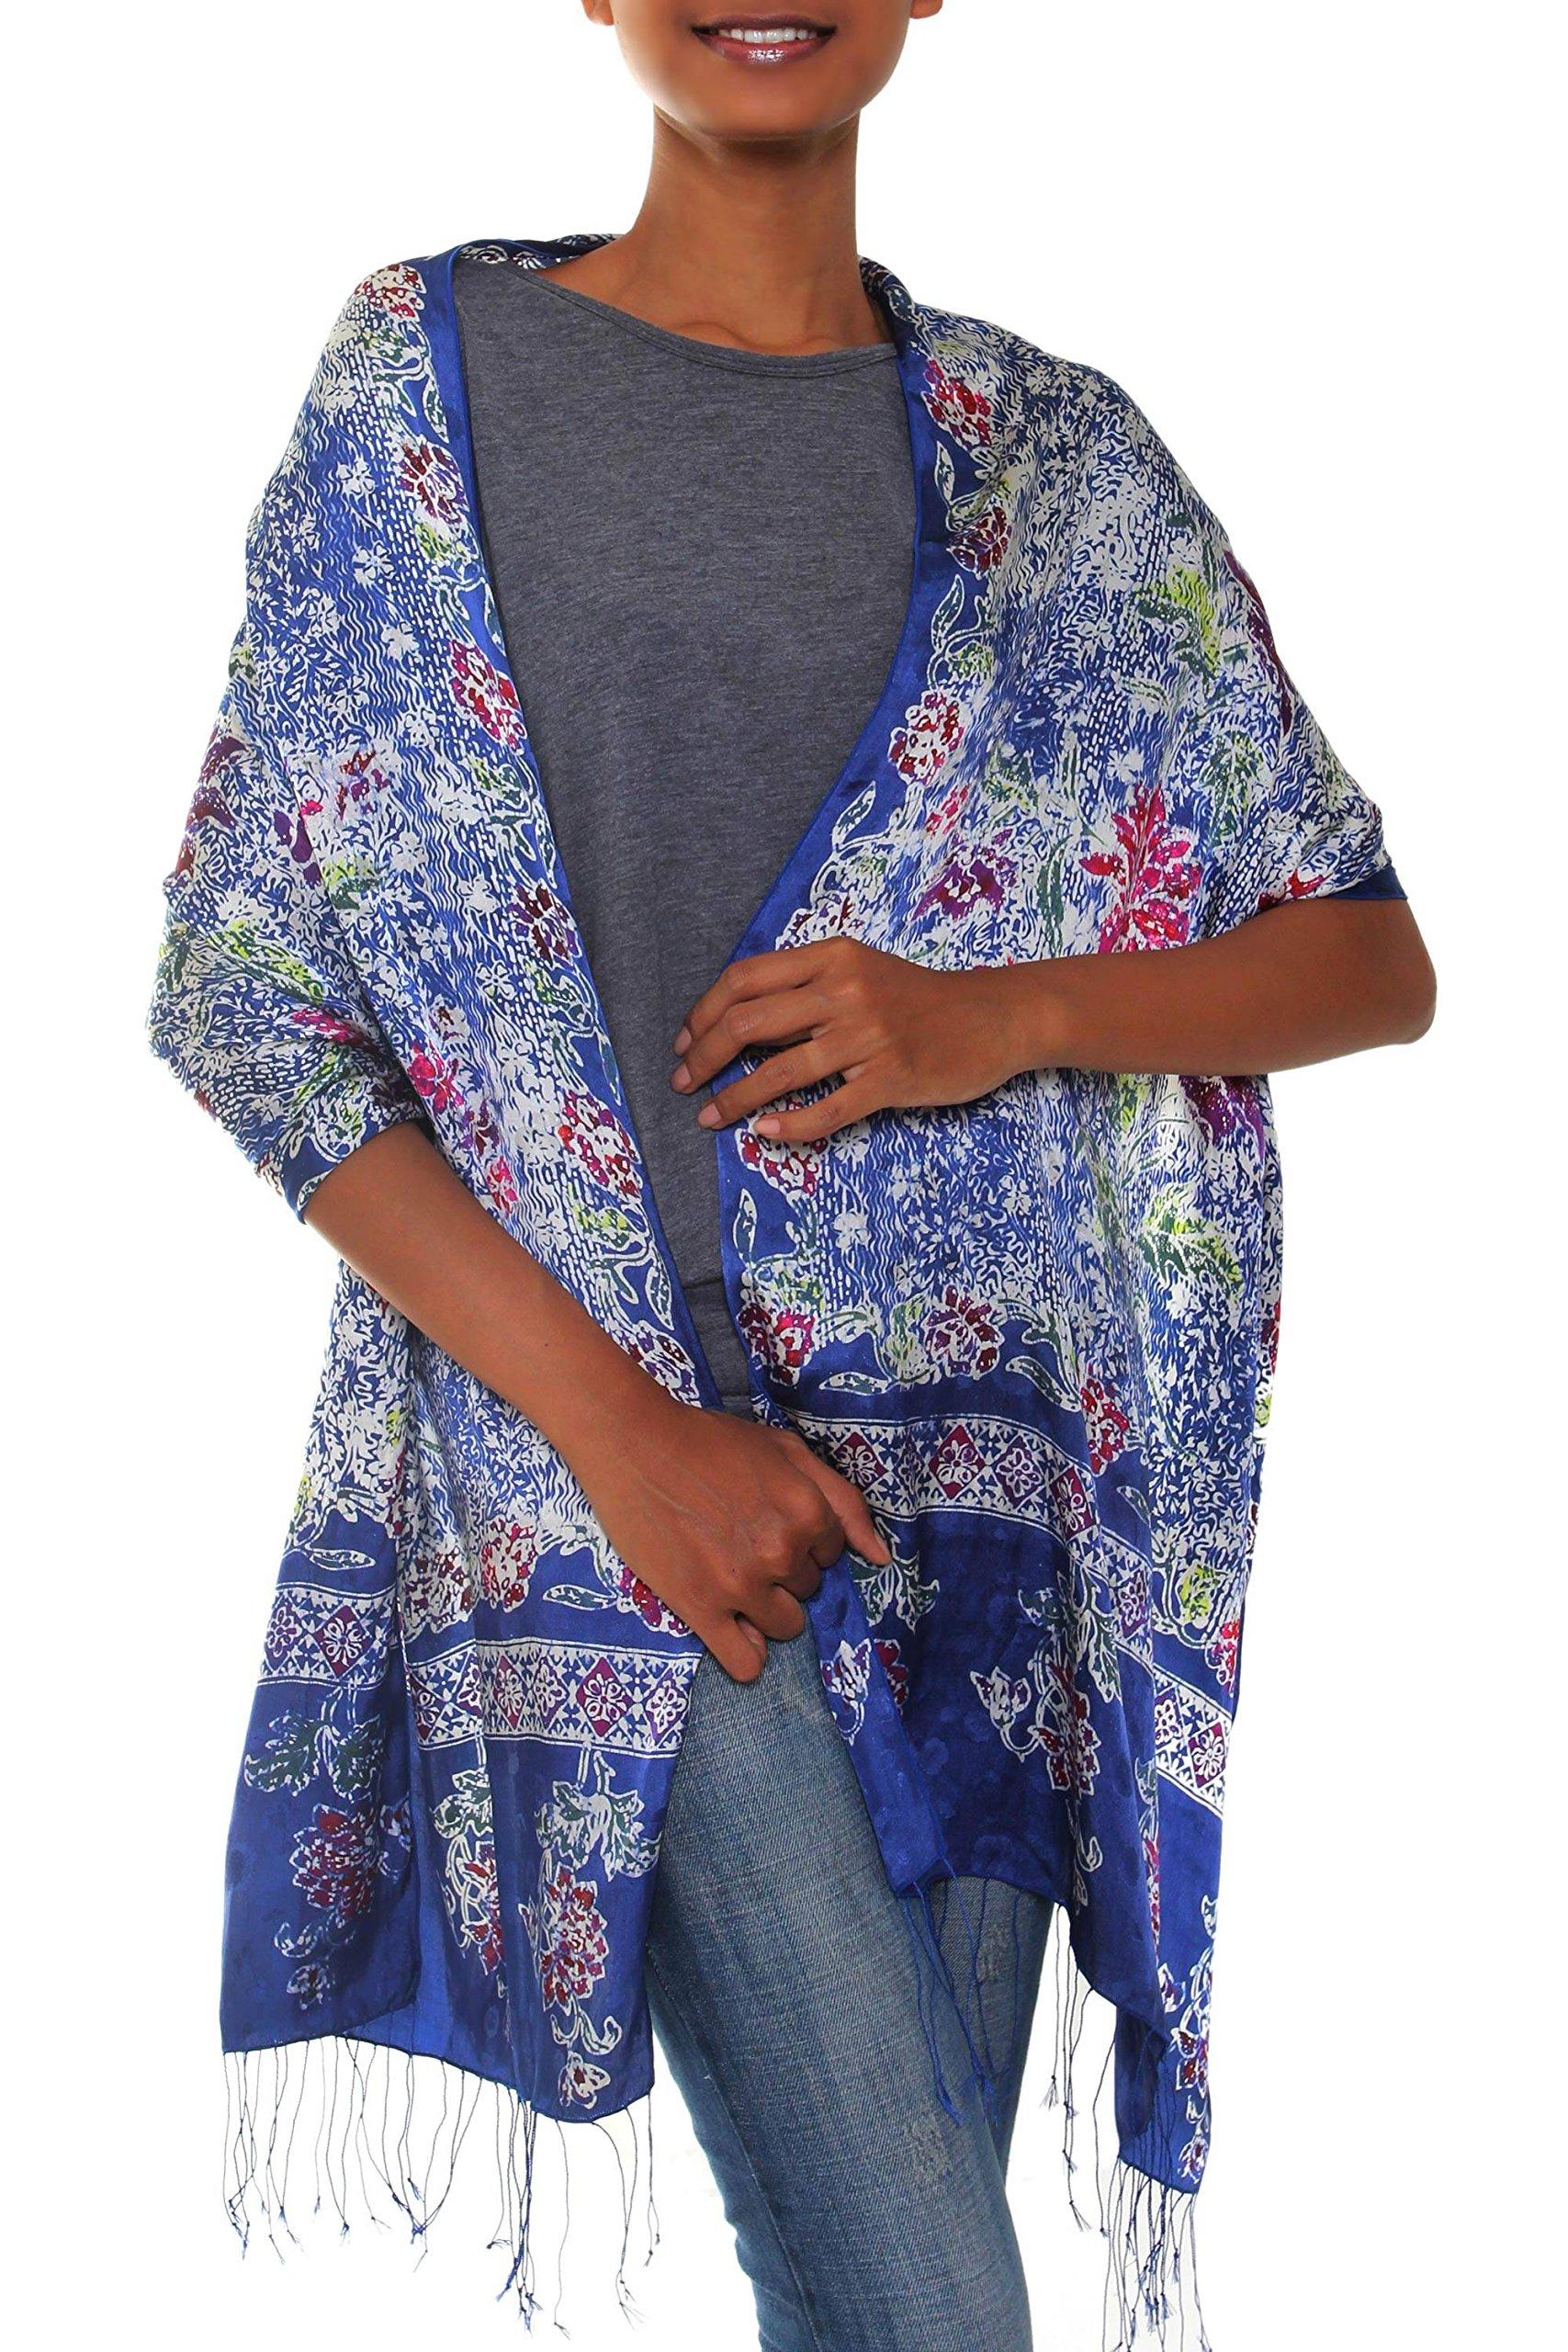 NOVICA Blue and Red Floral Print 100% Silk Batik Shawl Scarf, 'Sapphire Mums'